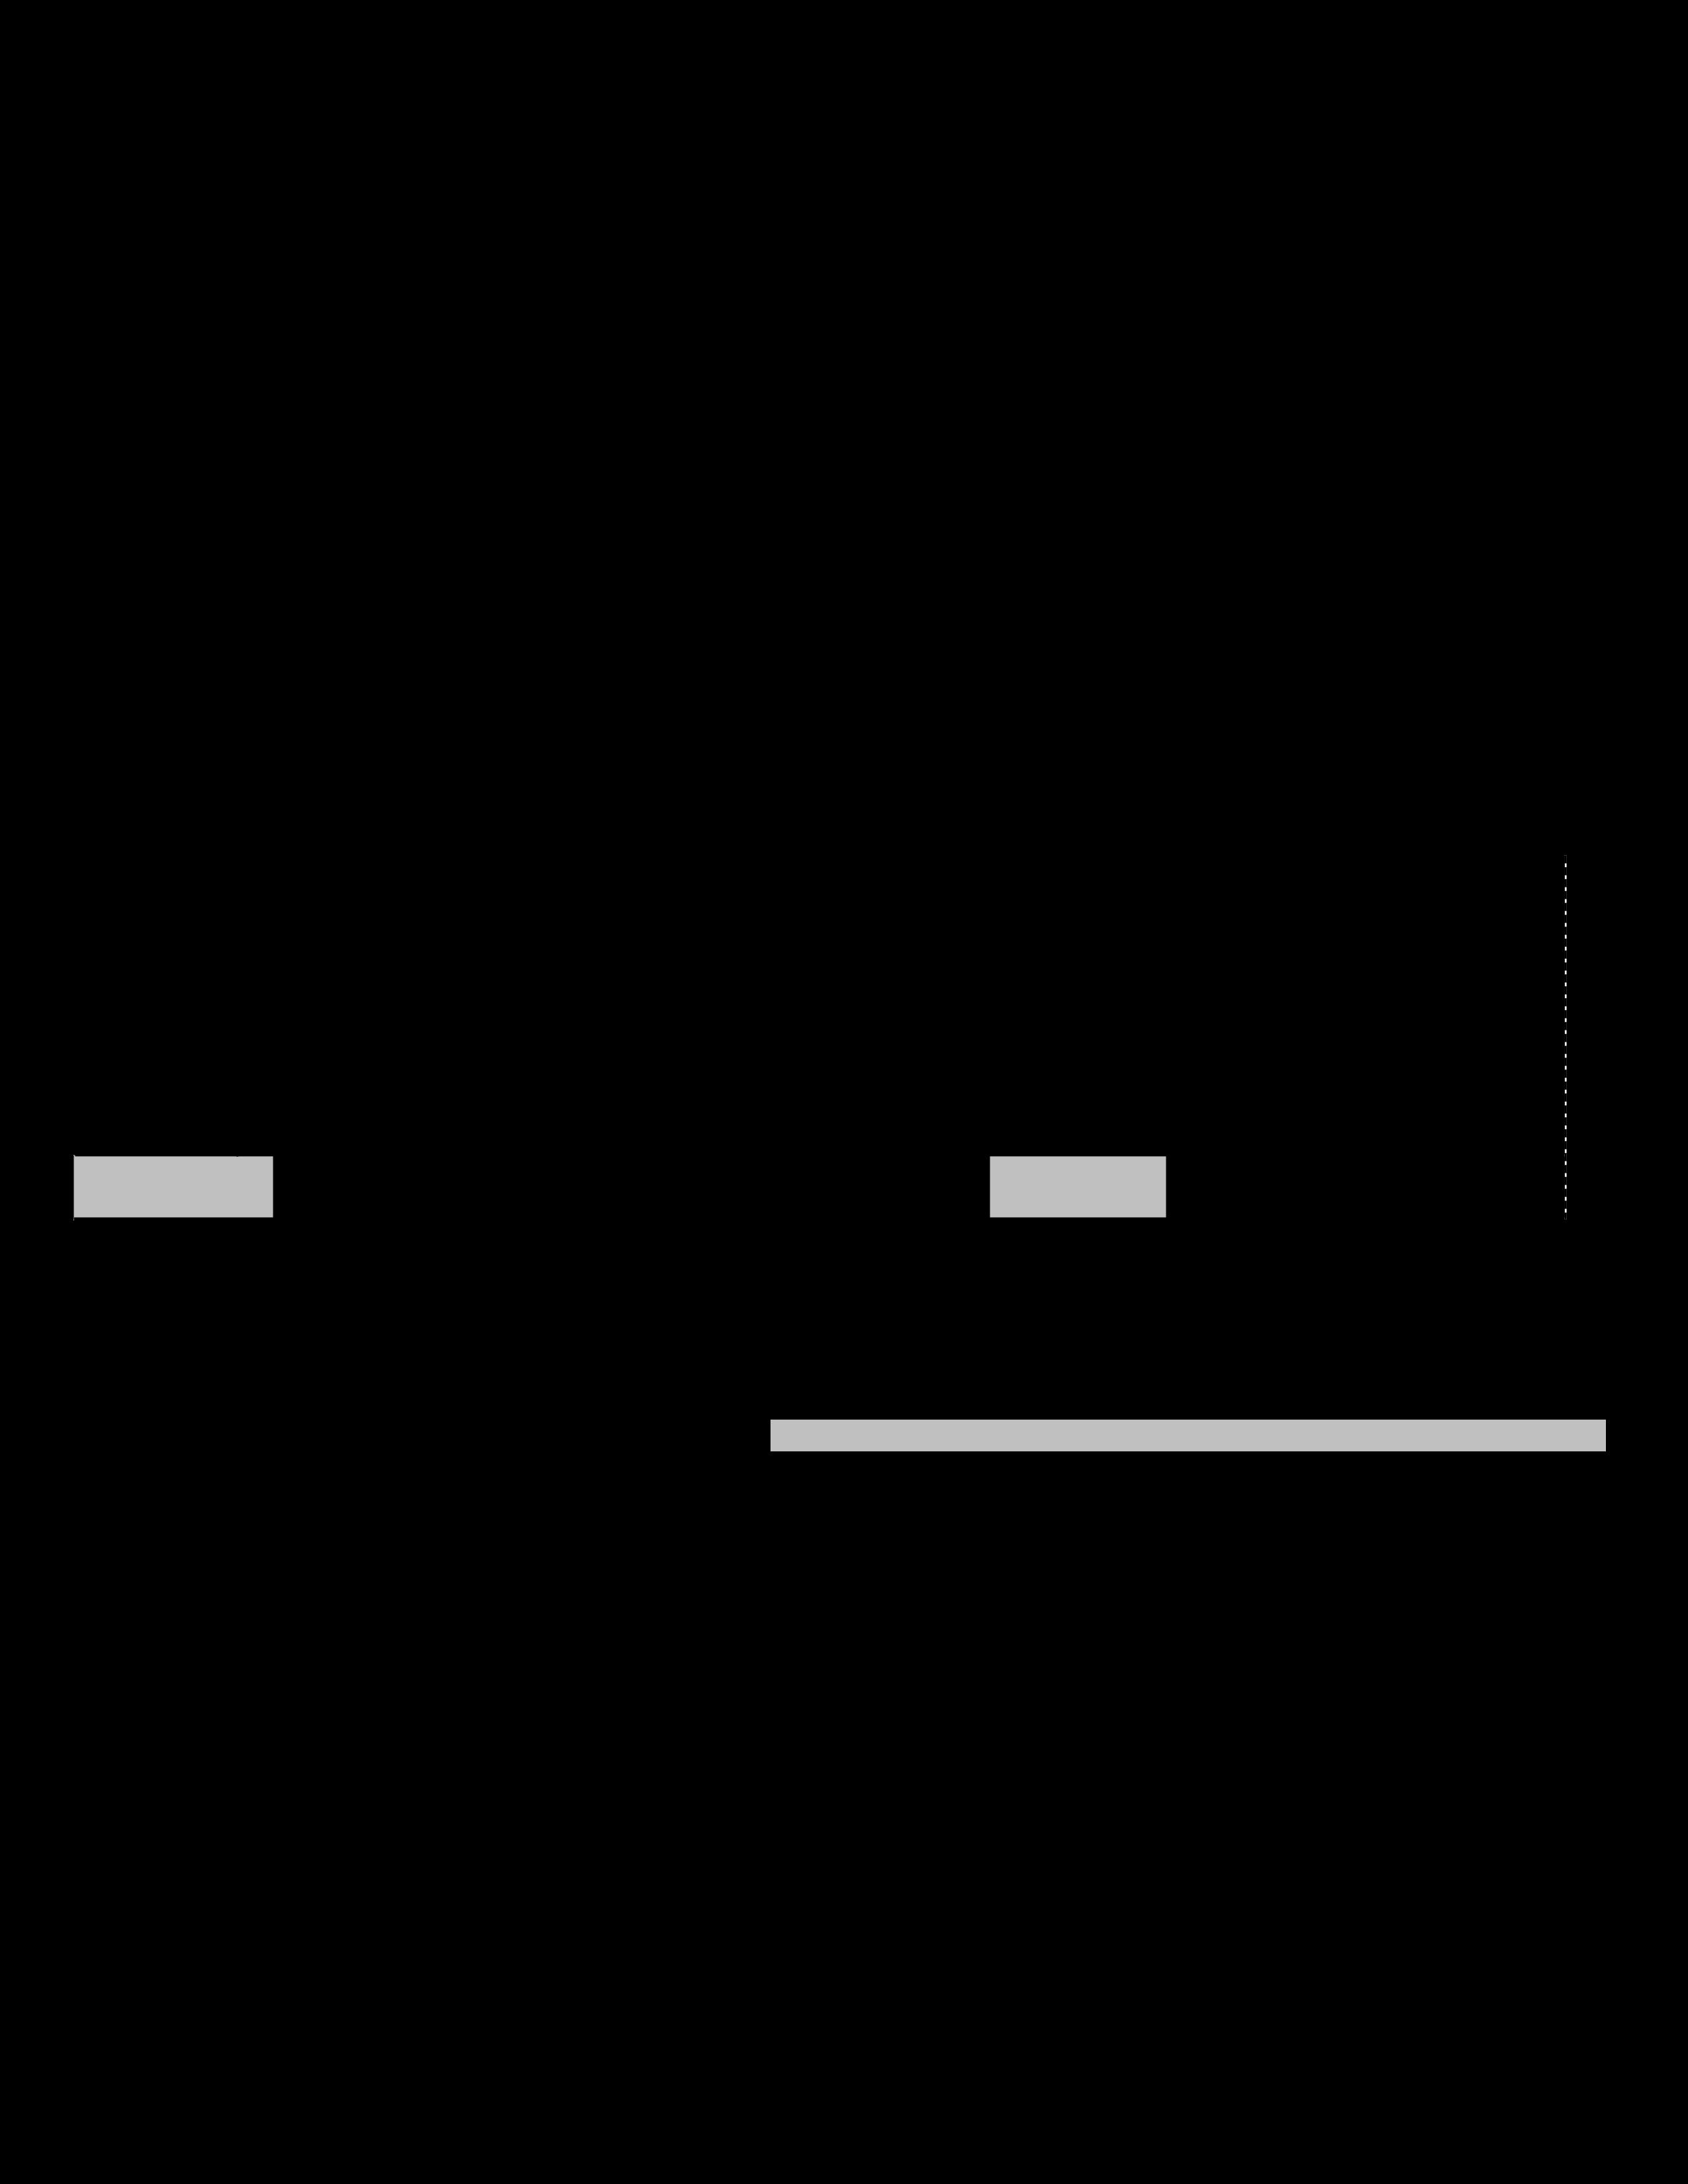 Bill Lading Sample | Templates at allbusinesstemplates com